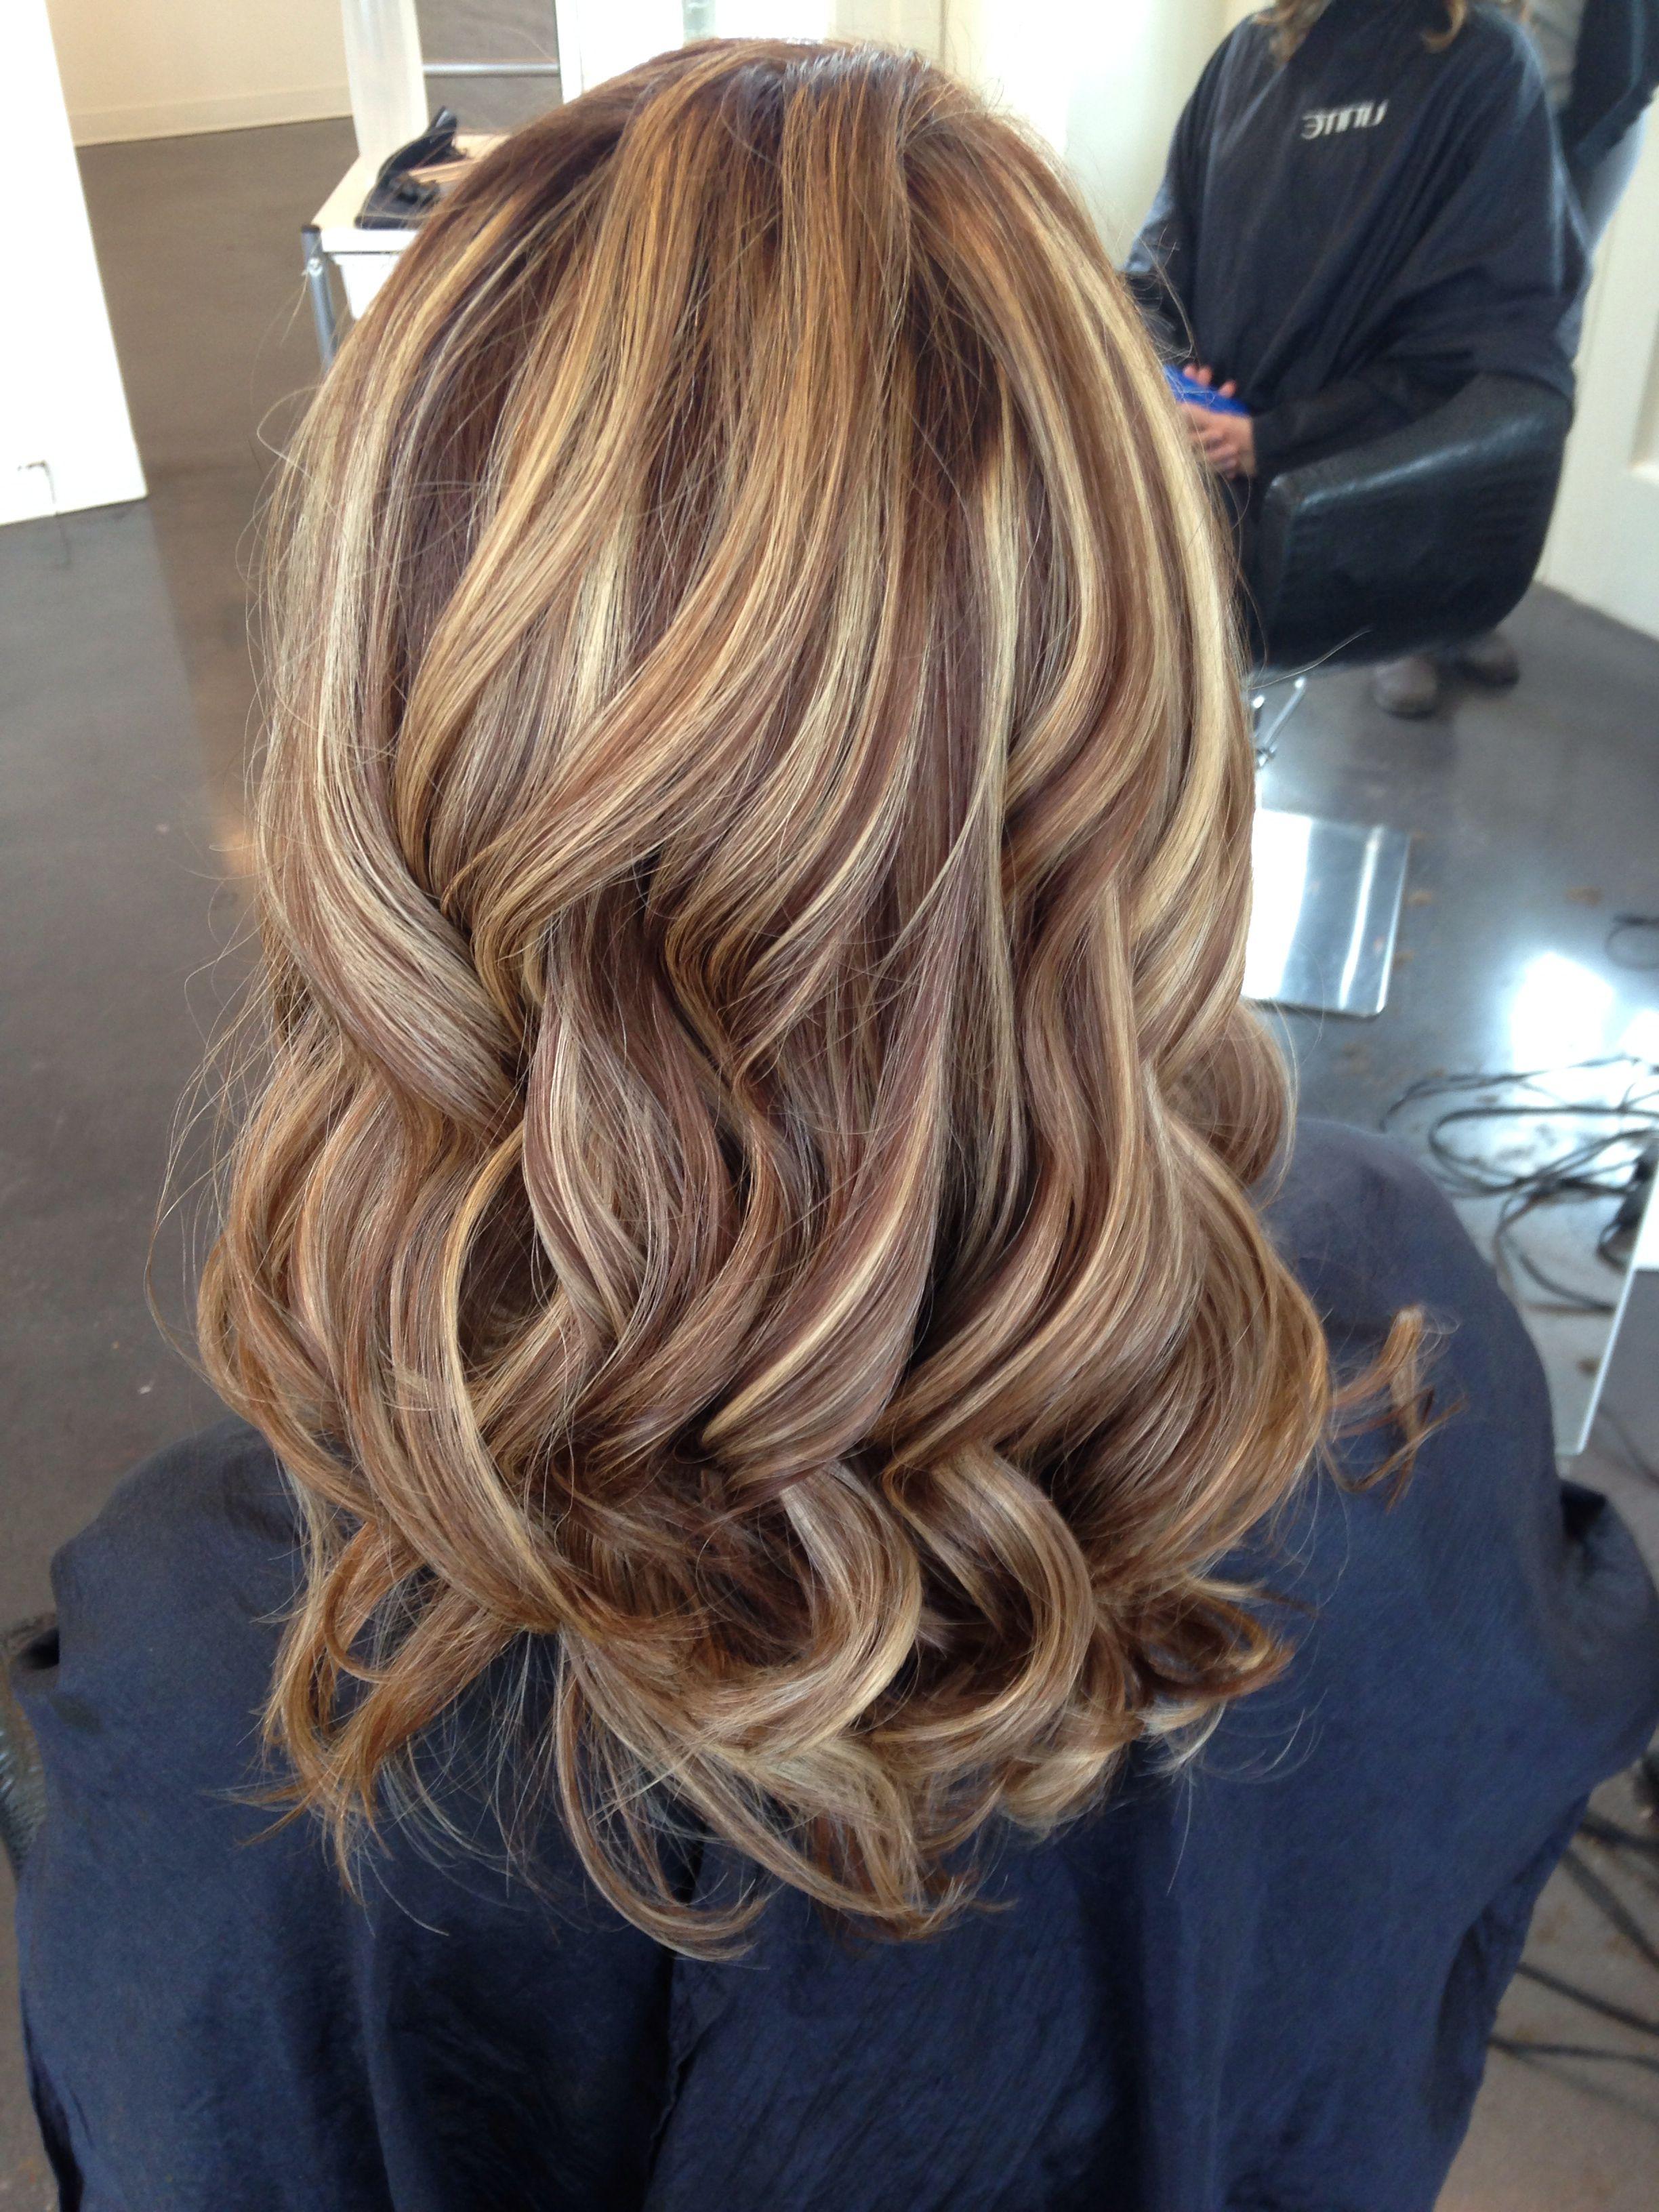 Warm Chocolate Brown Base With Golden Blonde Highlights Hairbysarahballay Highligh Brown Hair With Blonde Highlights Blonde Hair With Highlights Hair Styles